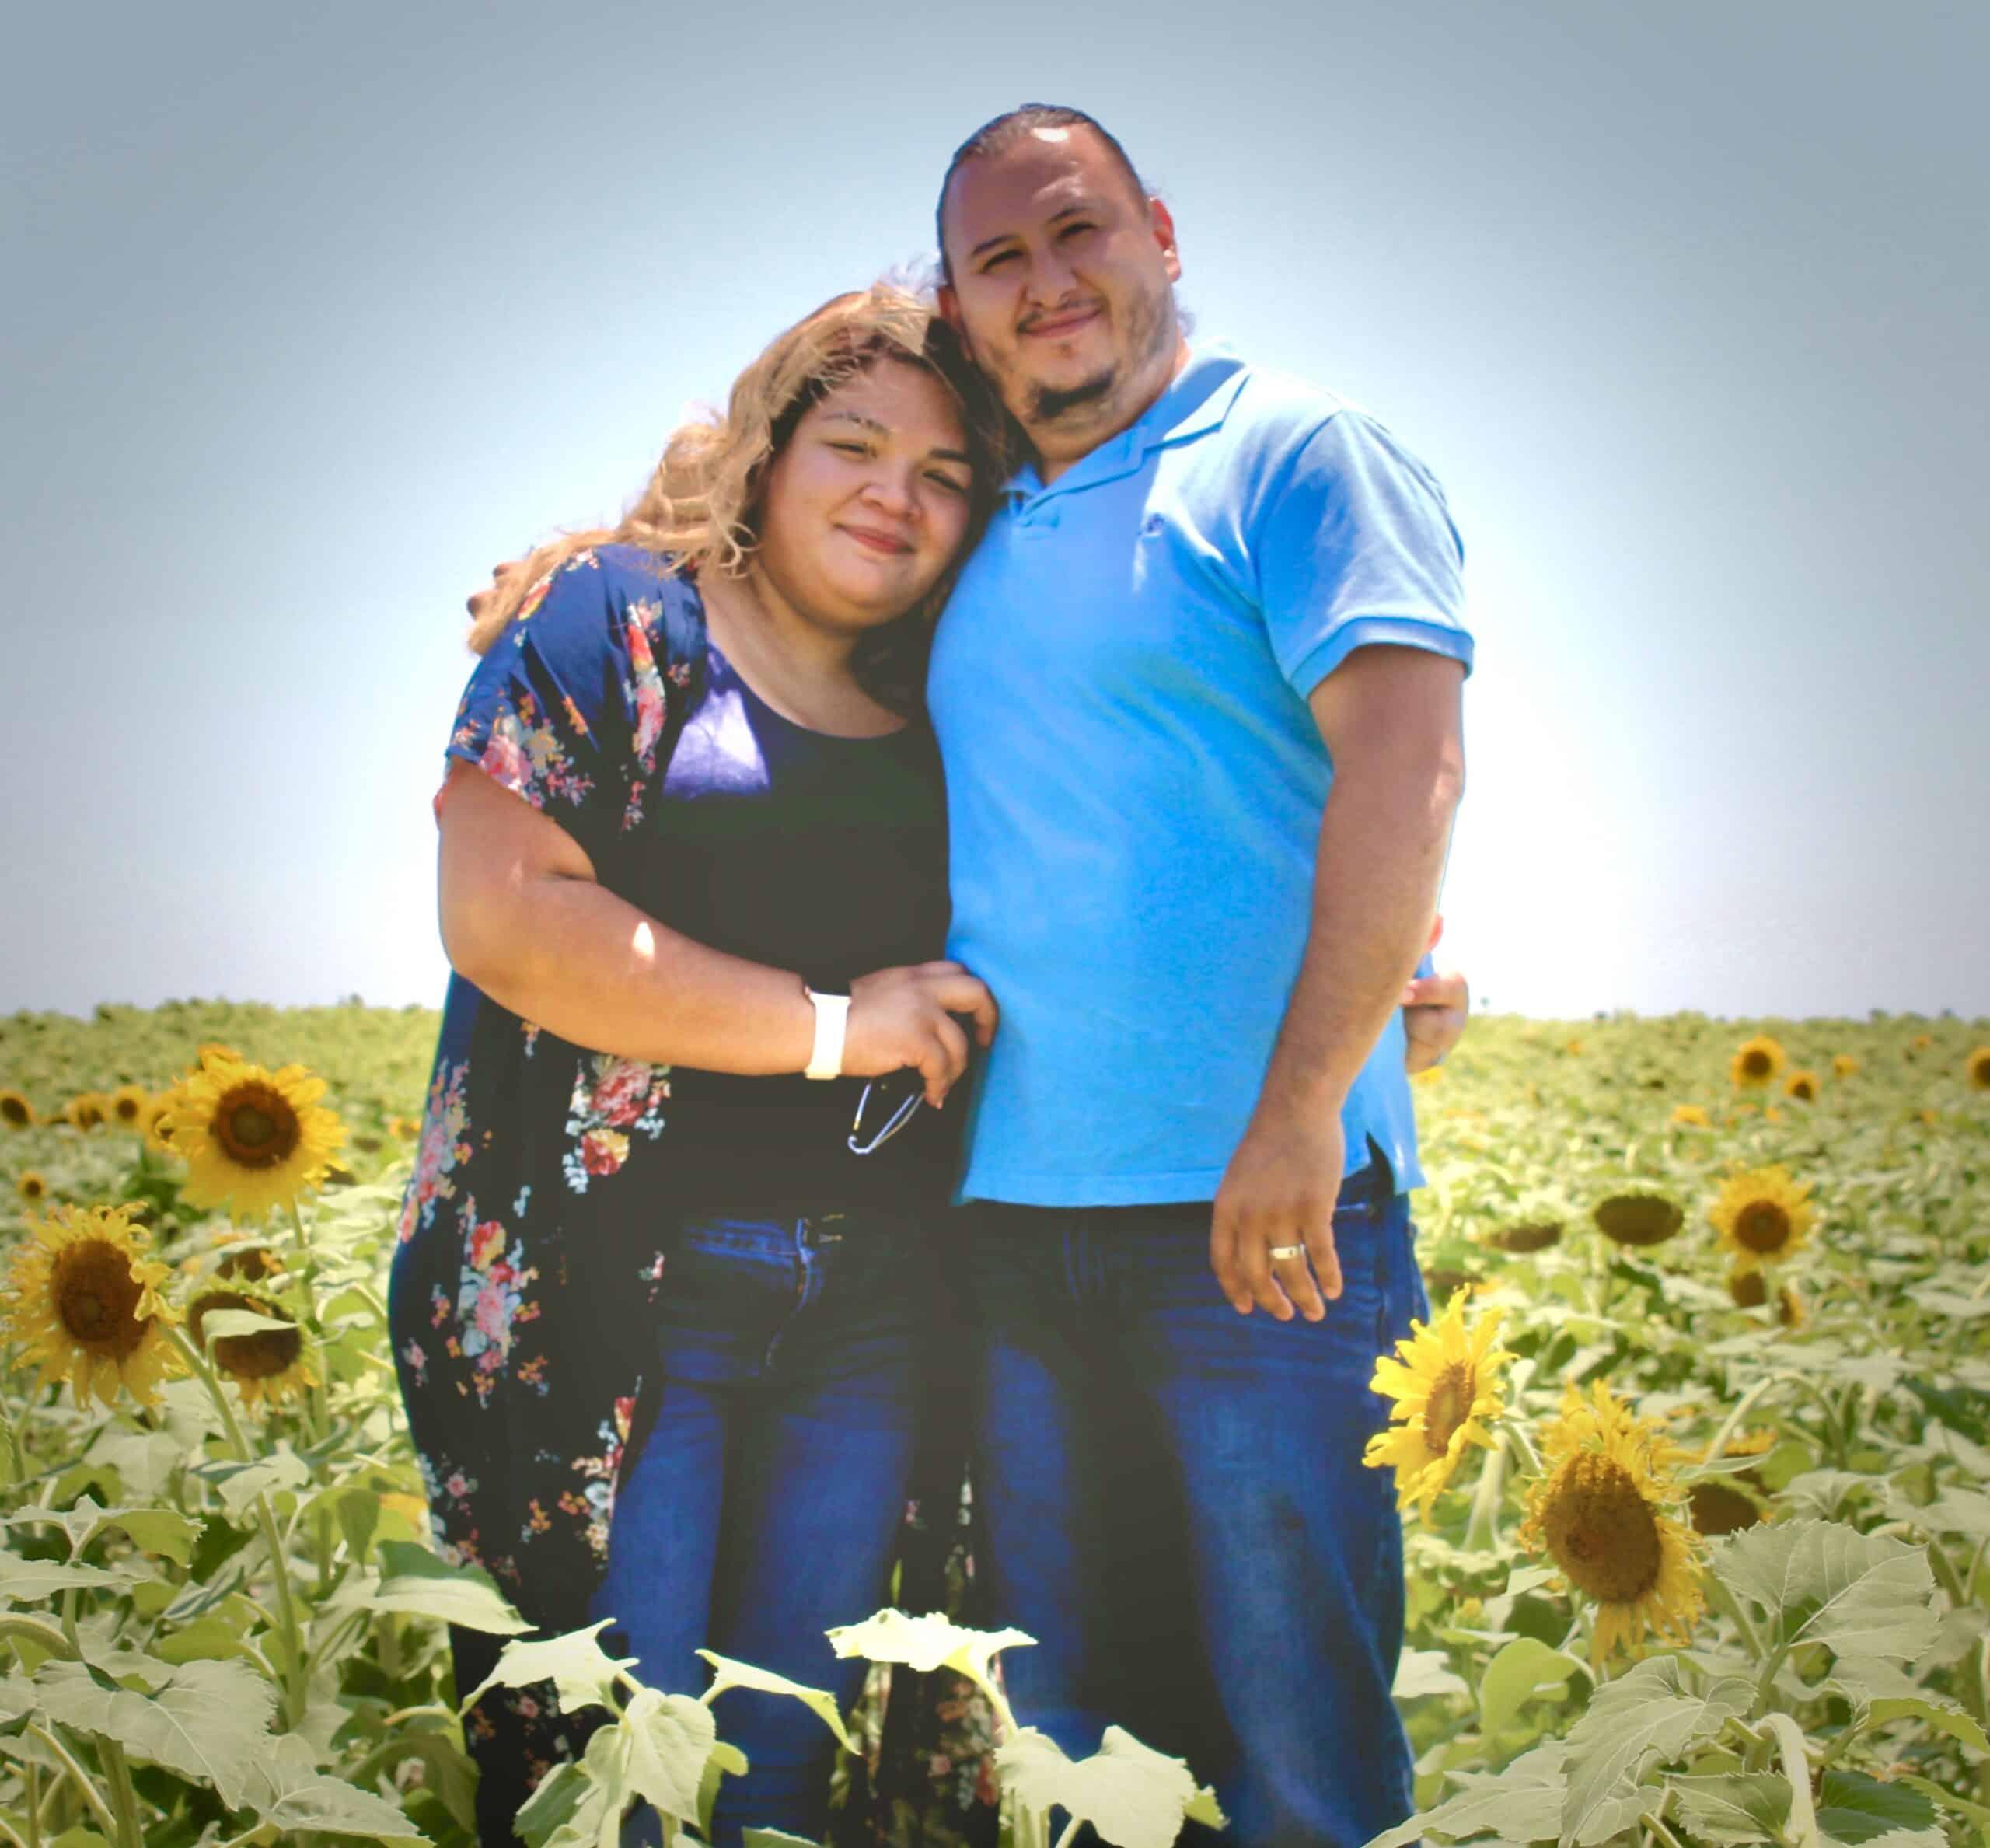 Adoptive parents Brad and Rachel